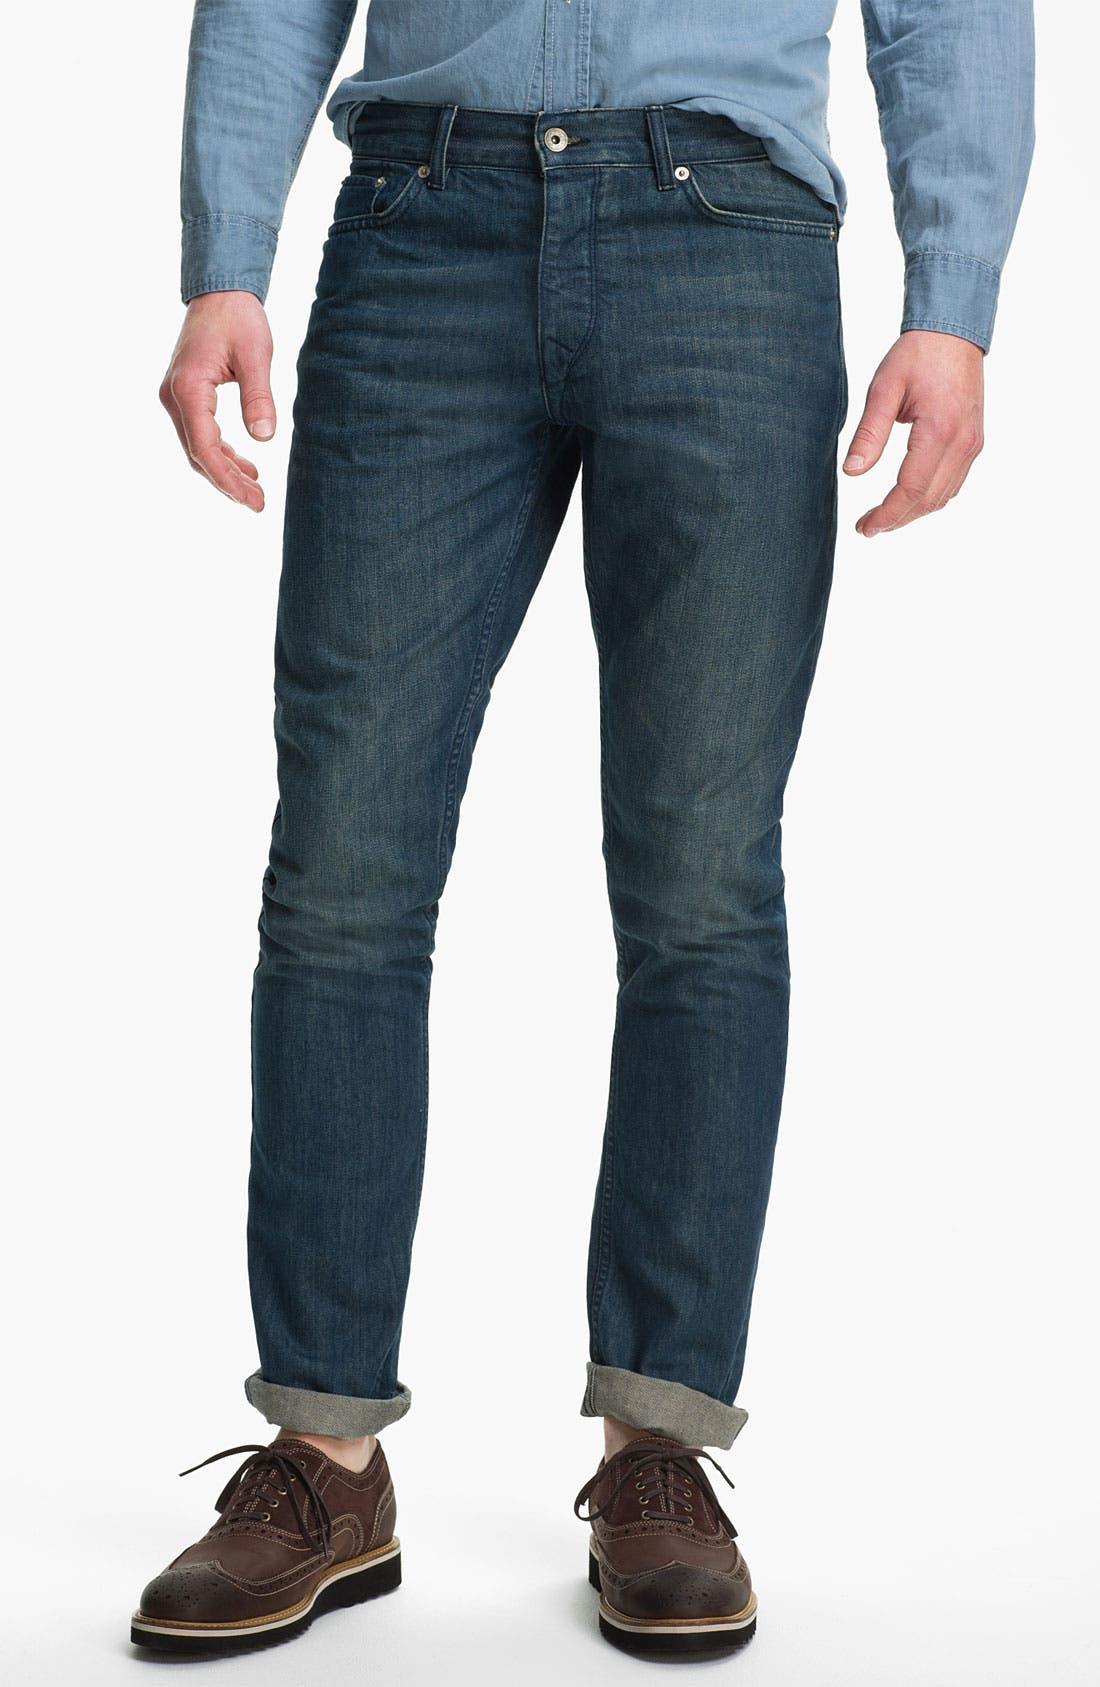 Alternate Image 1 Selected - Topman 'Isaac' Vintage Slim Fit Jeans (Mid Blue)